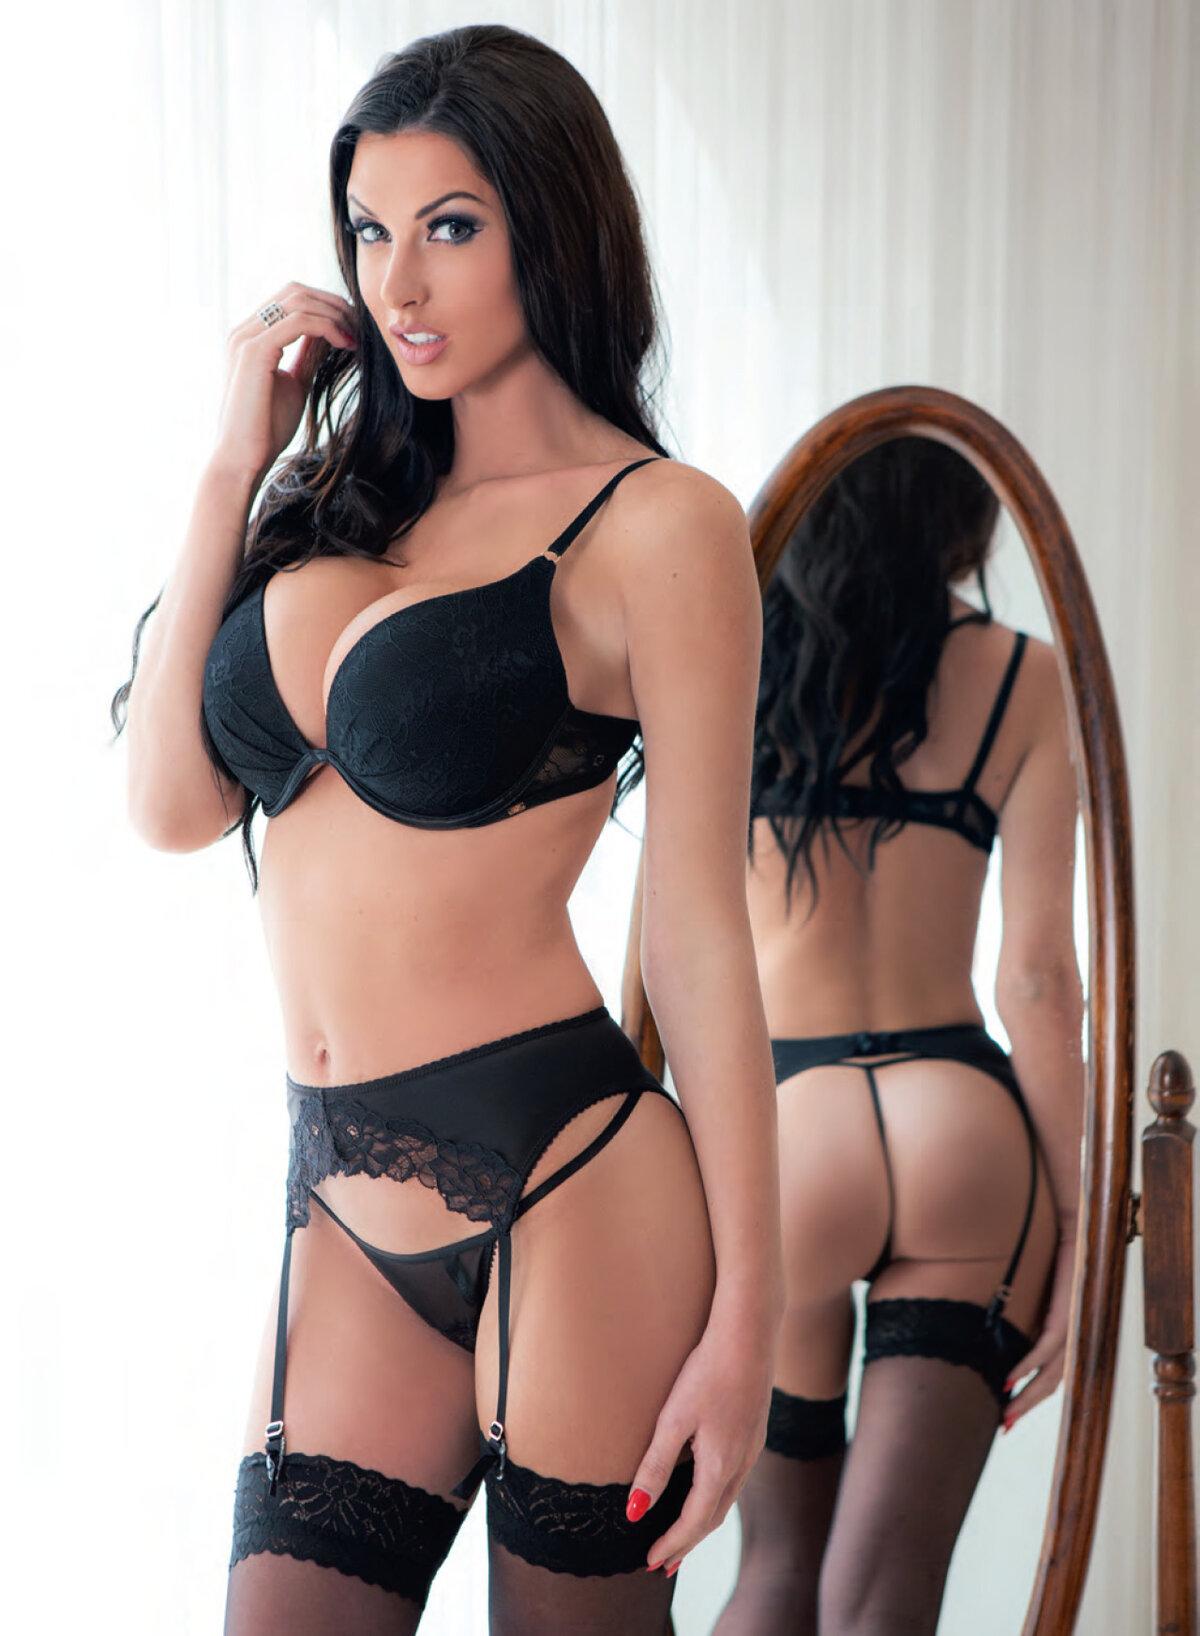 Monster asian big tits in black lingerie